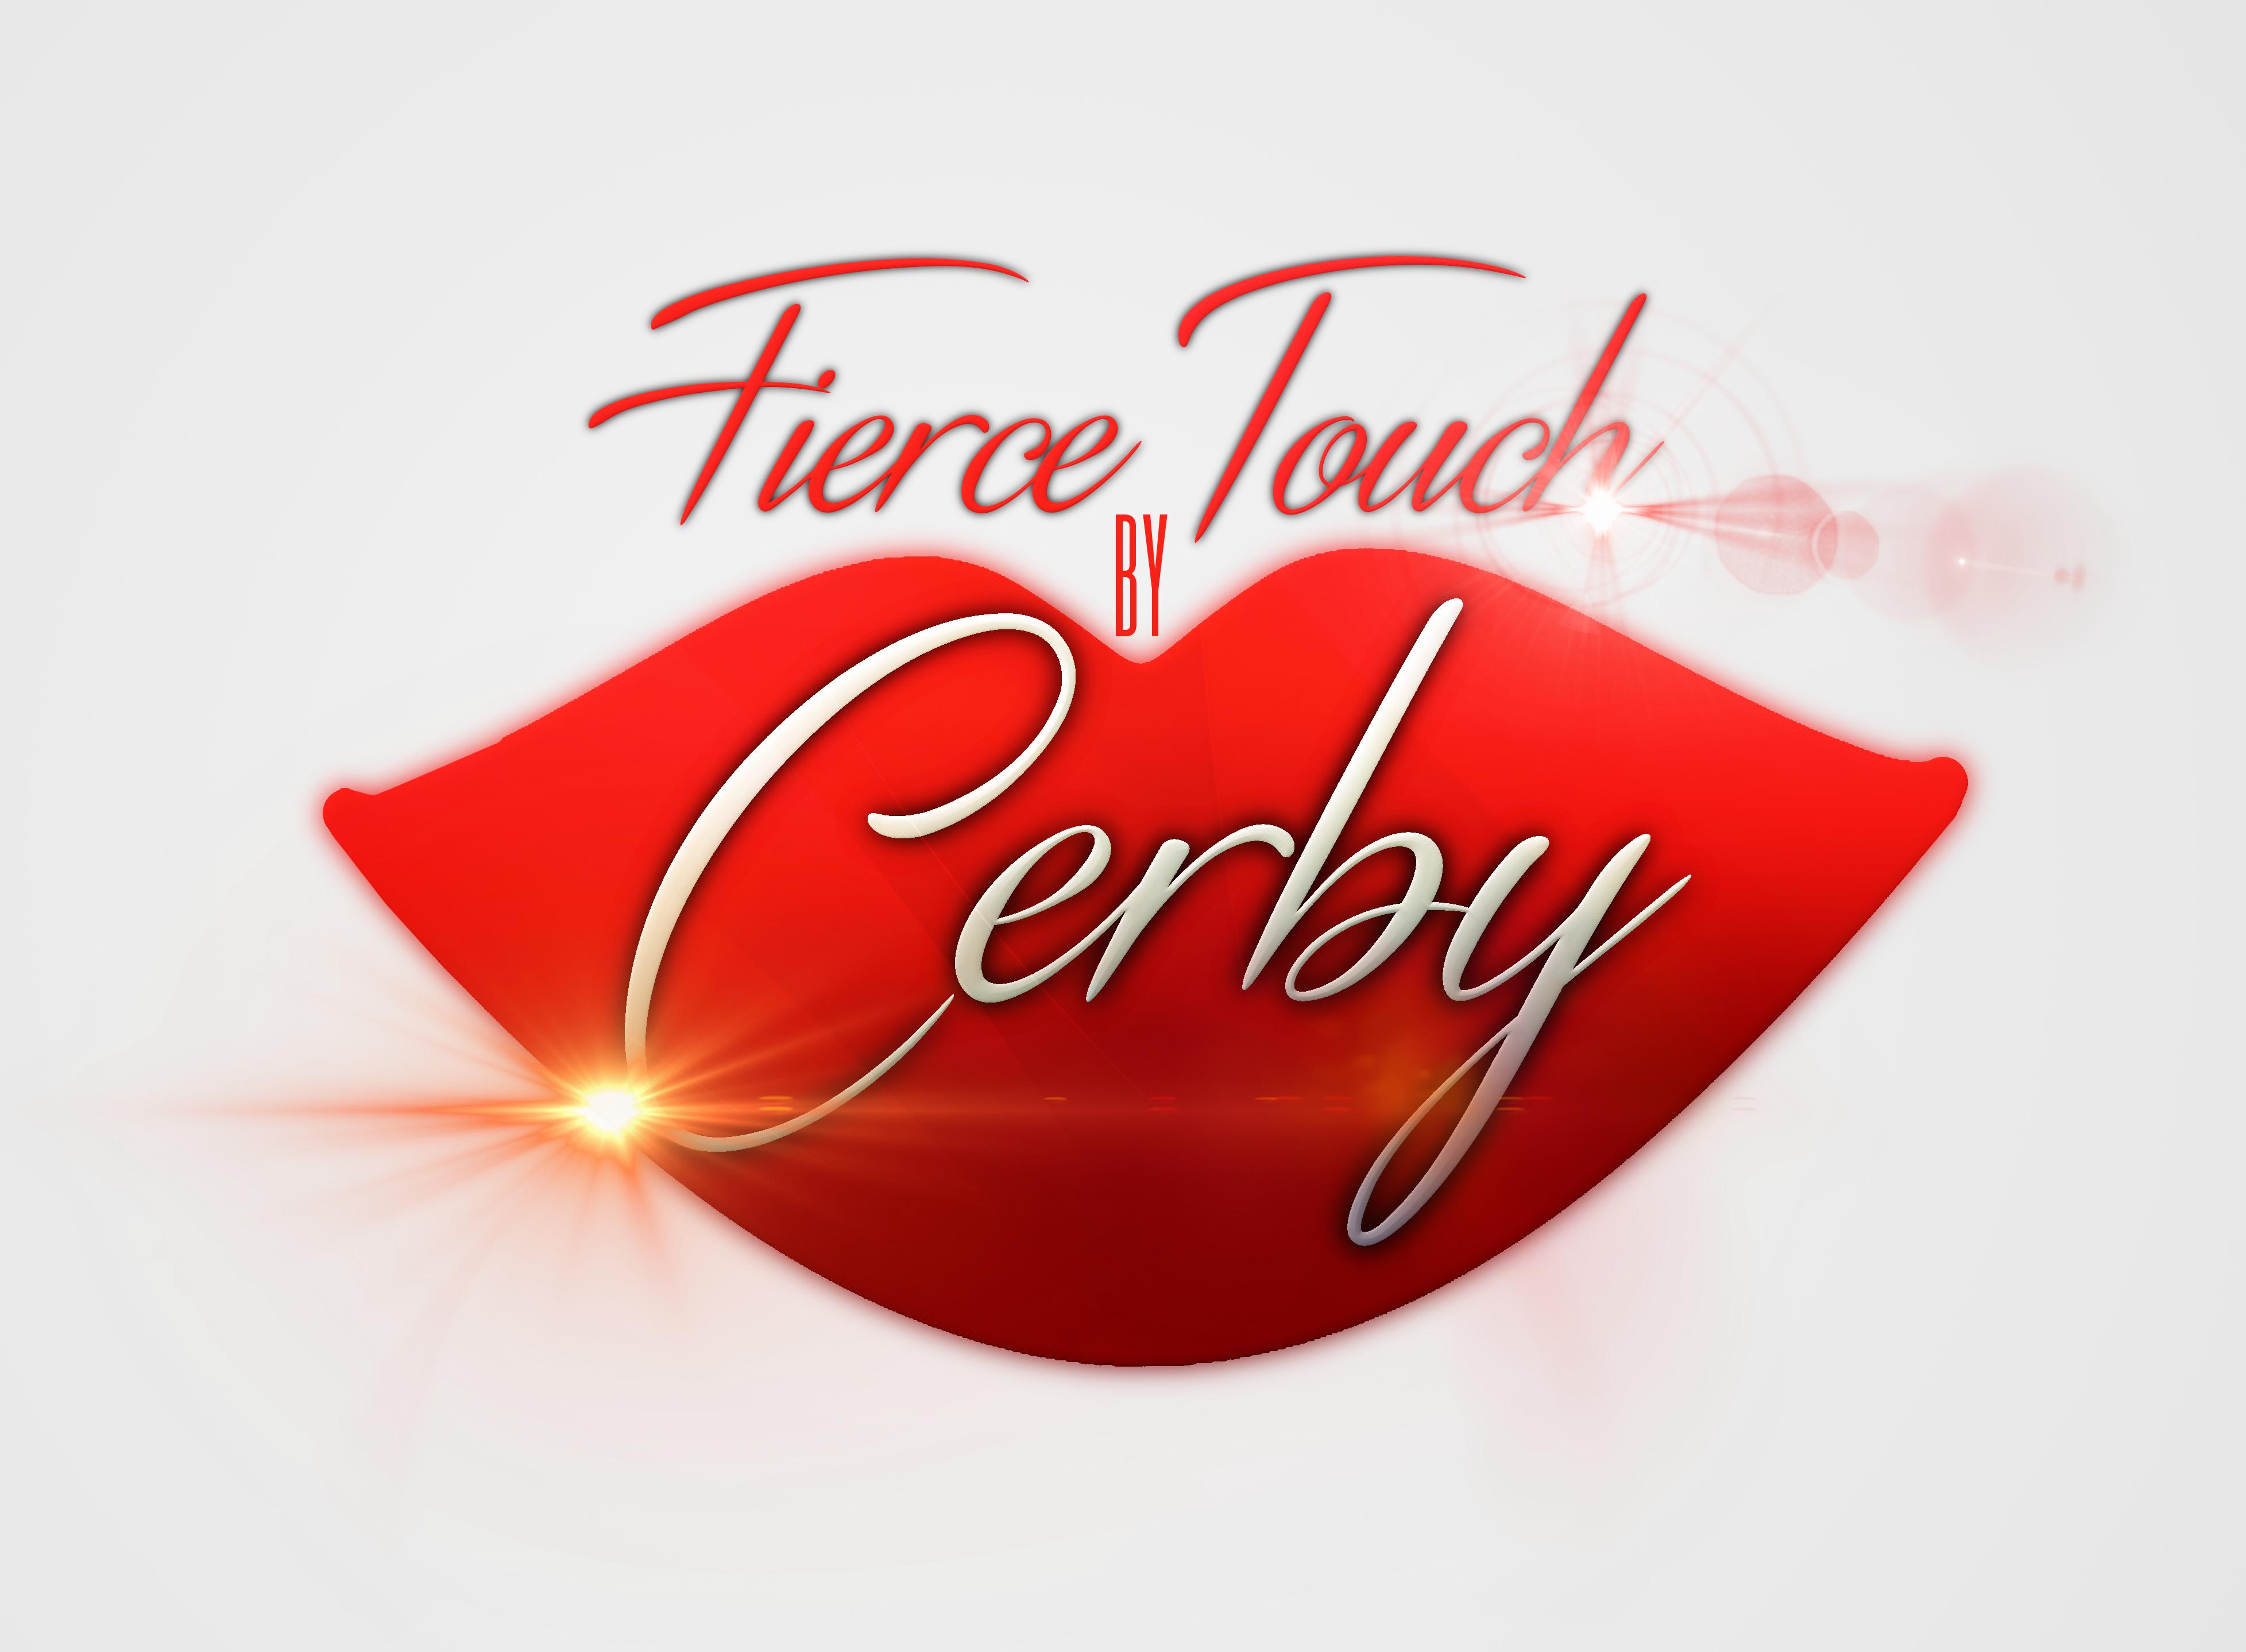 FierceTouchByCerby2